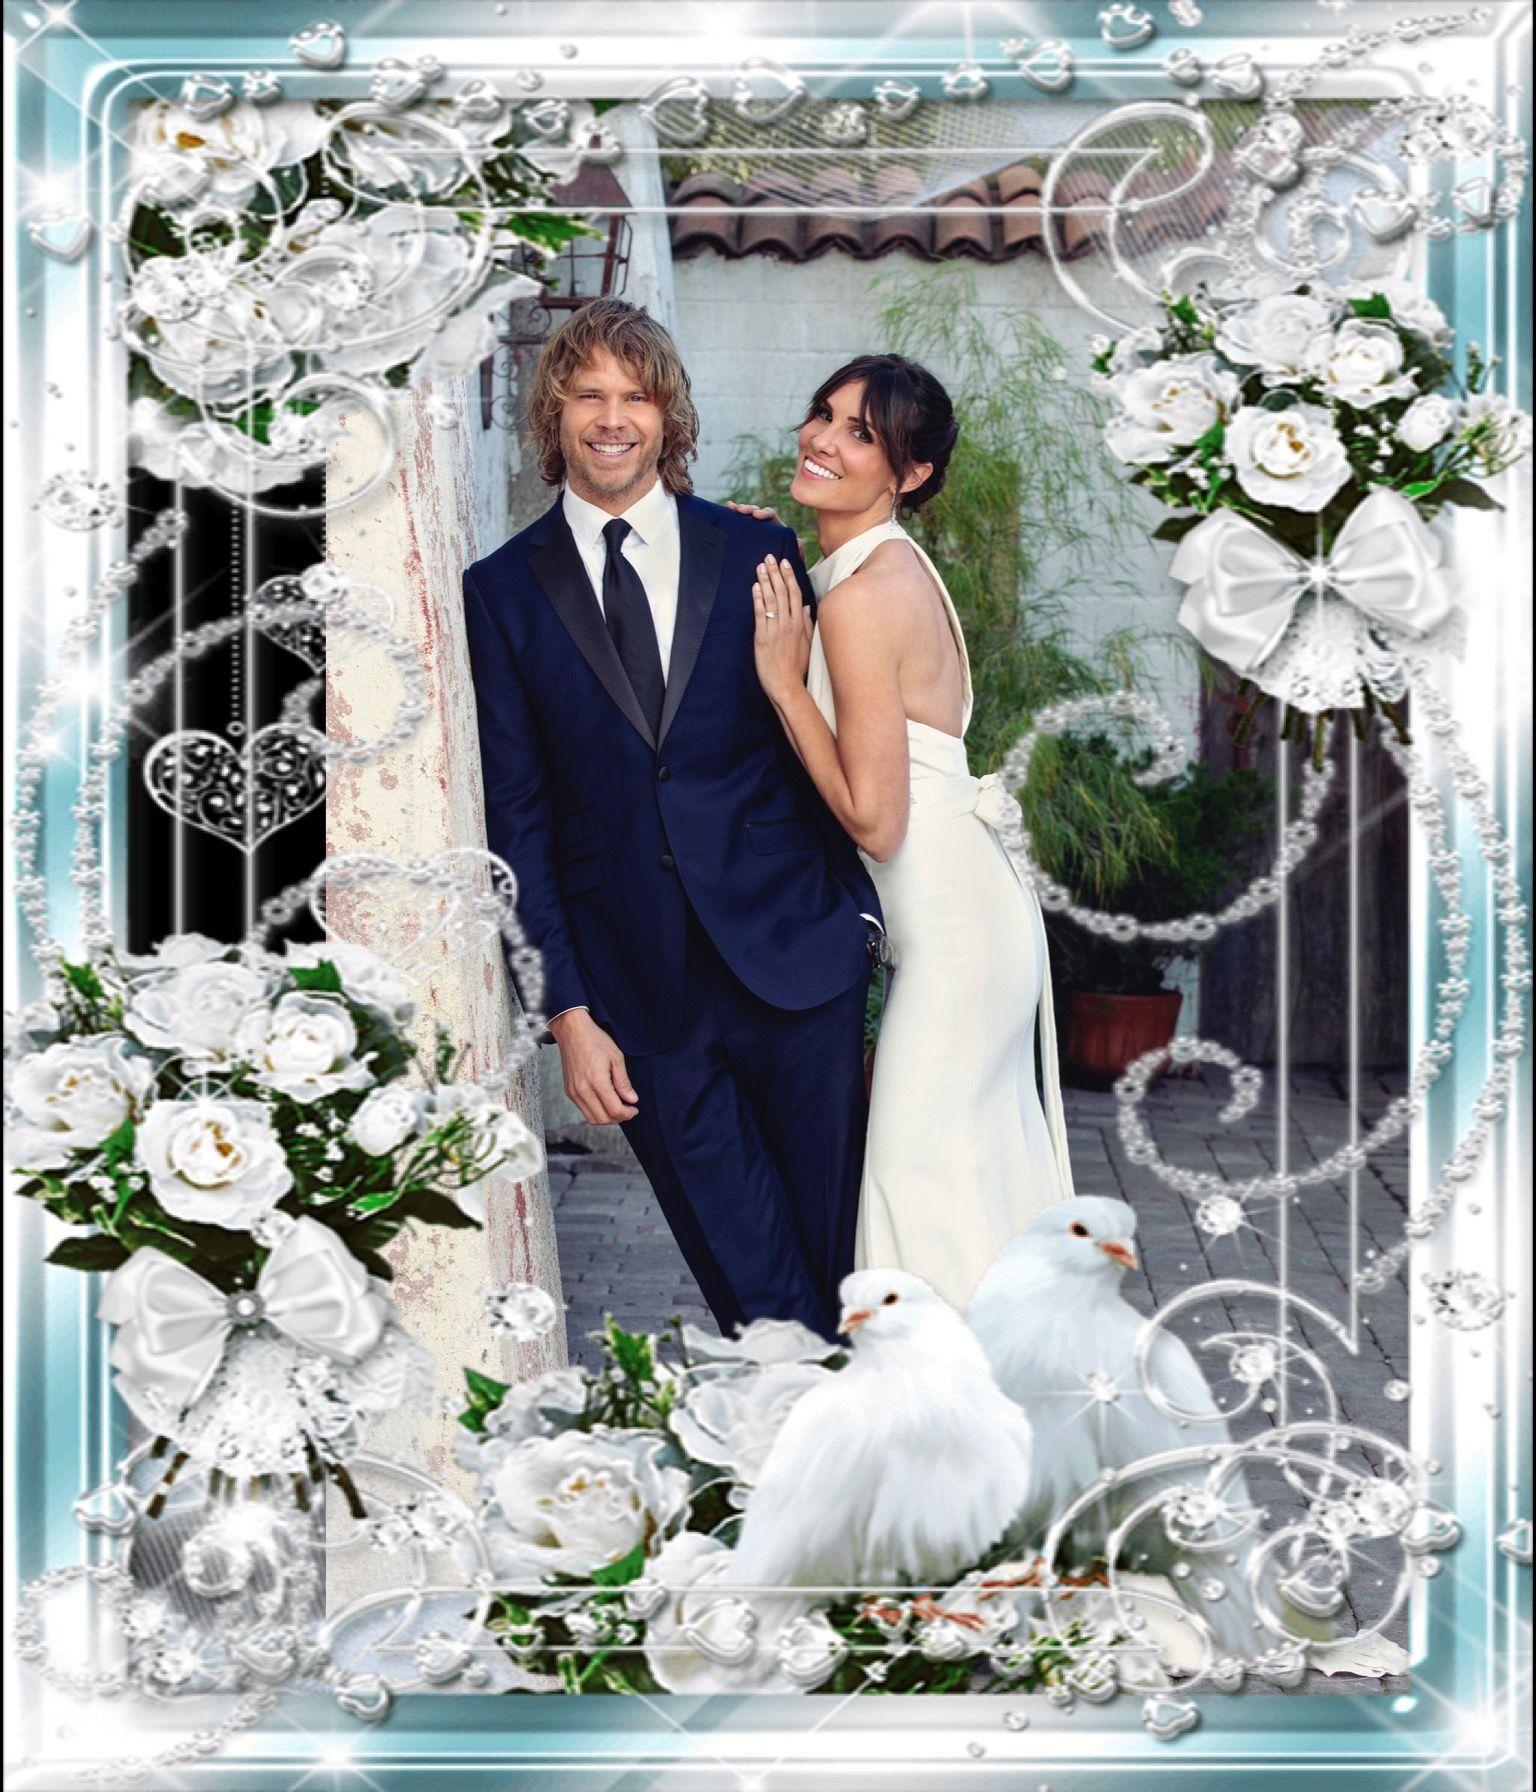 Wedding photo creation of Kensi and Deeks. | Ncis los